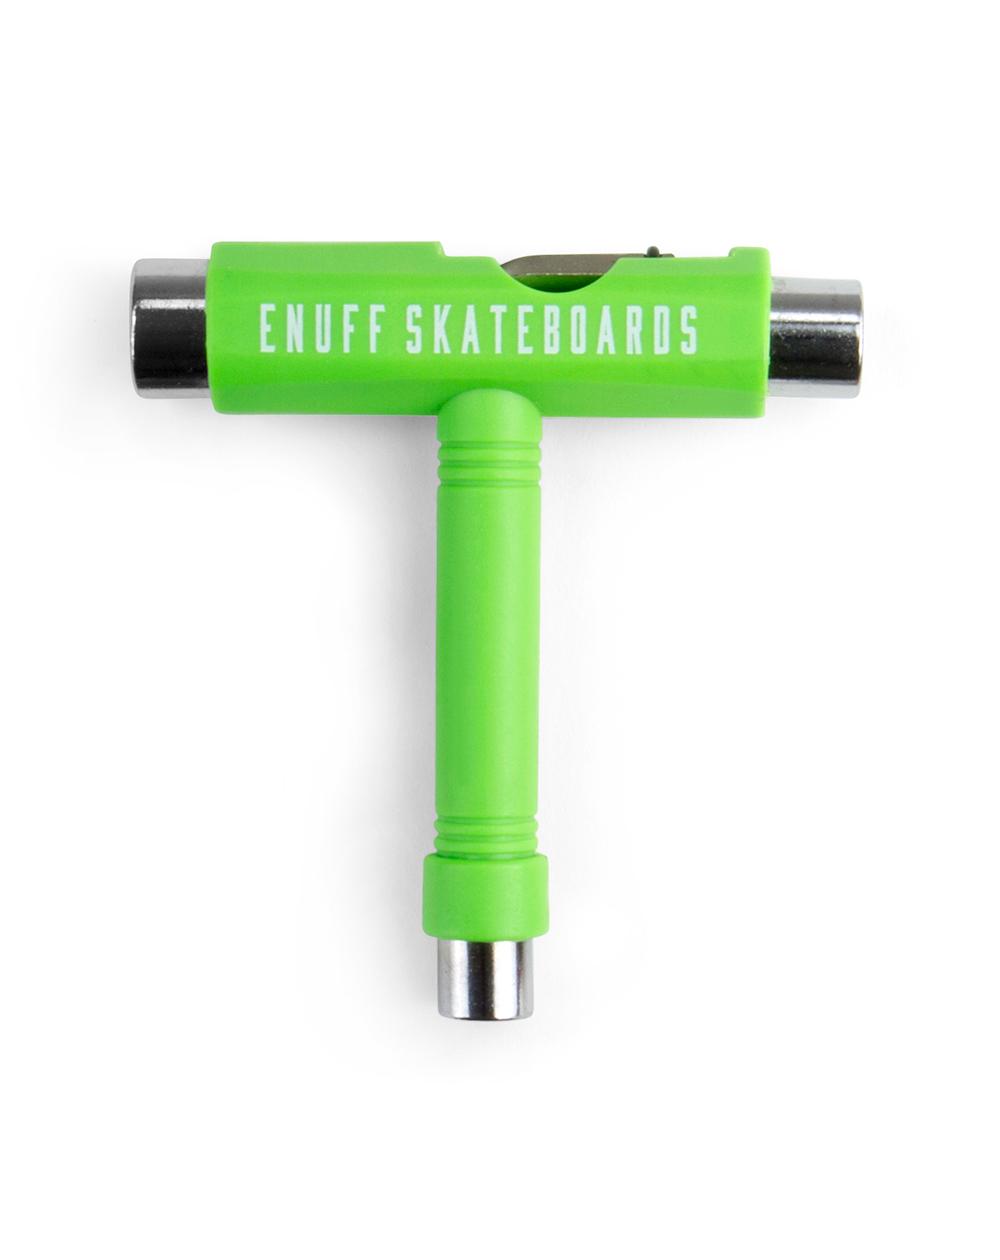 Enuff Chiave Multiuso Skateboard Essential Tool Green